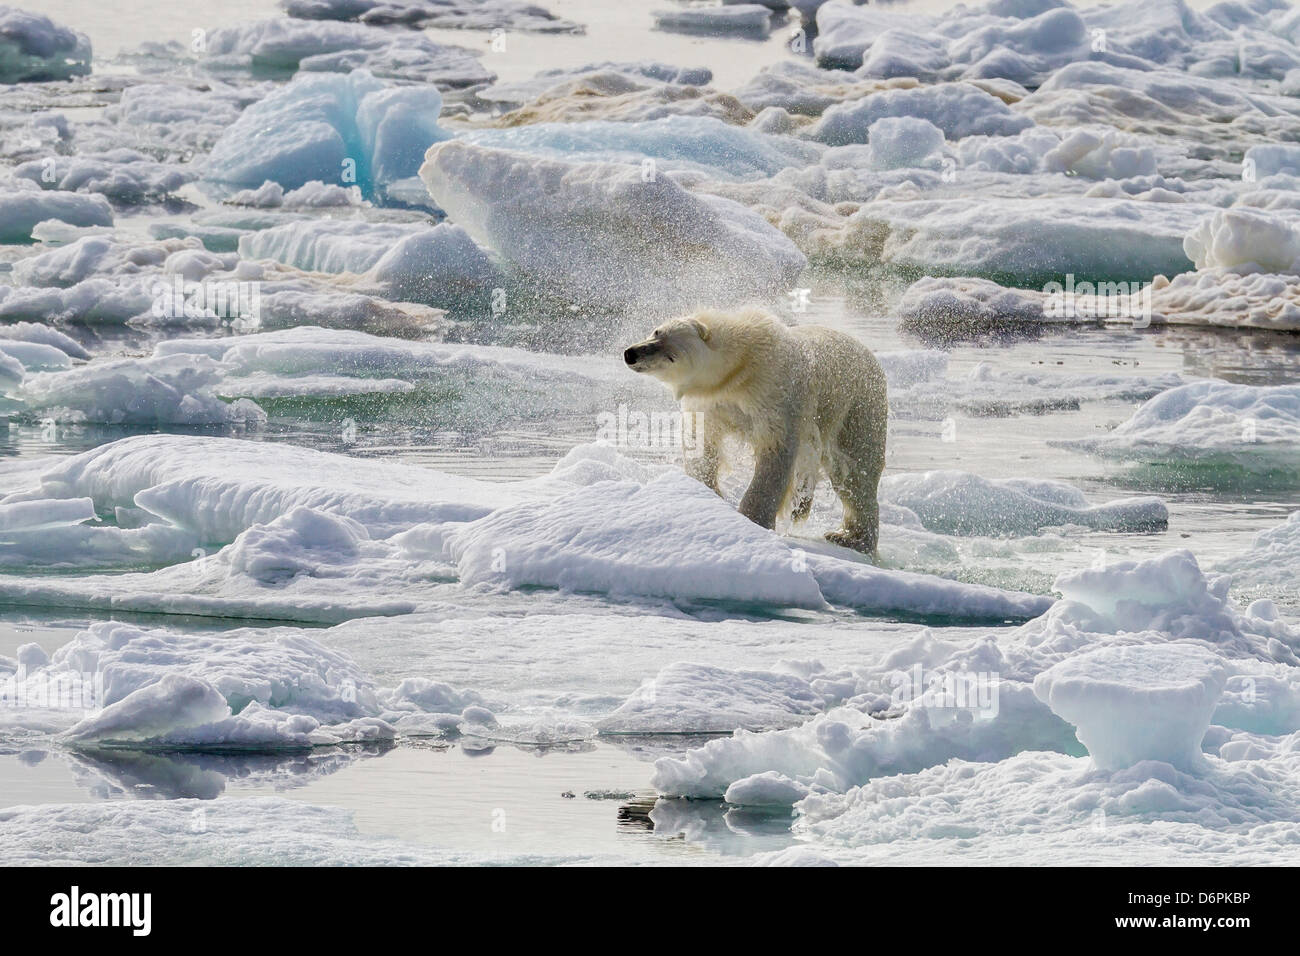 Adult polar bear (Ursus maritimus) drying out on the ice in Bear Sound, Spitsbergen Island, Svalbard, Norway, Scandinavia - Stock Image